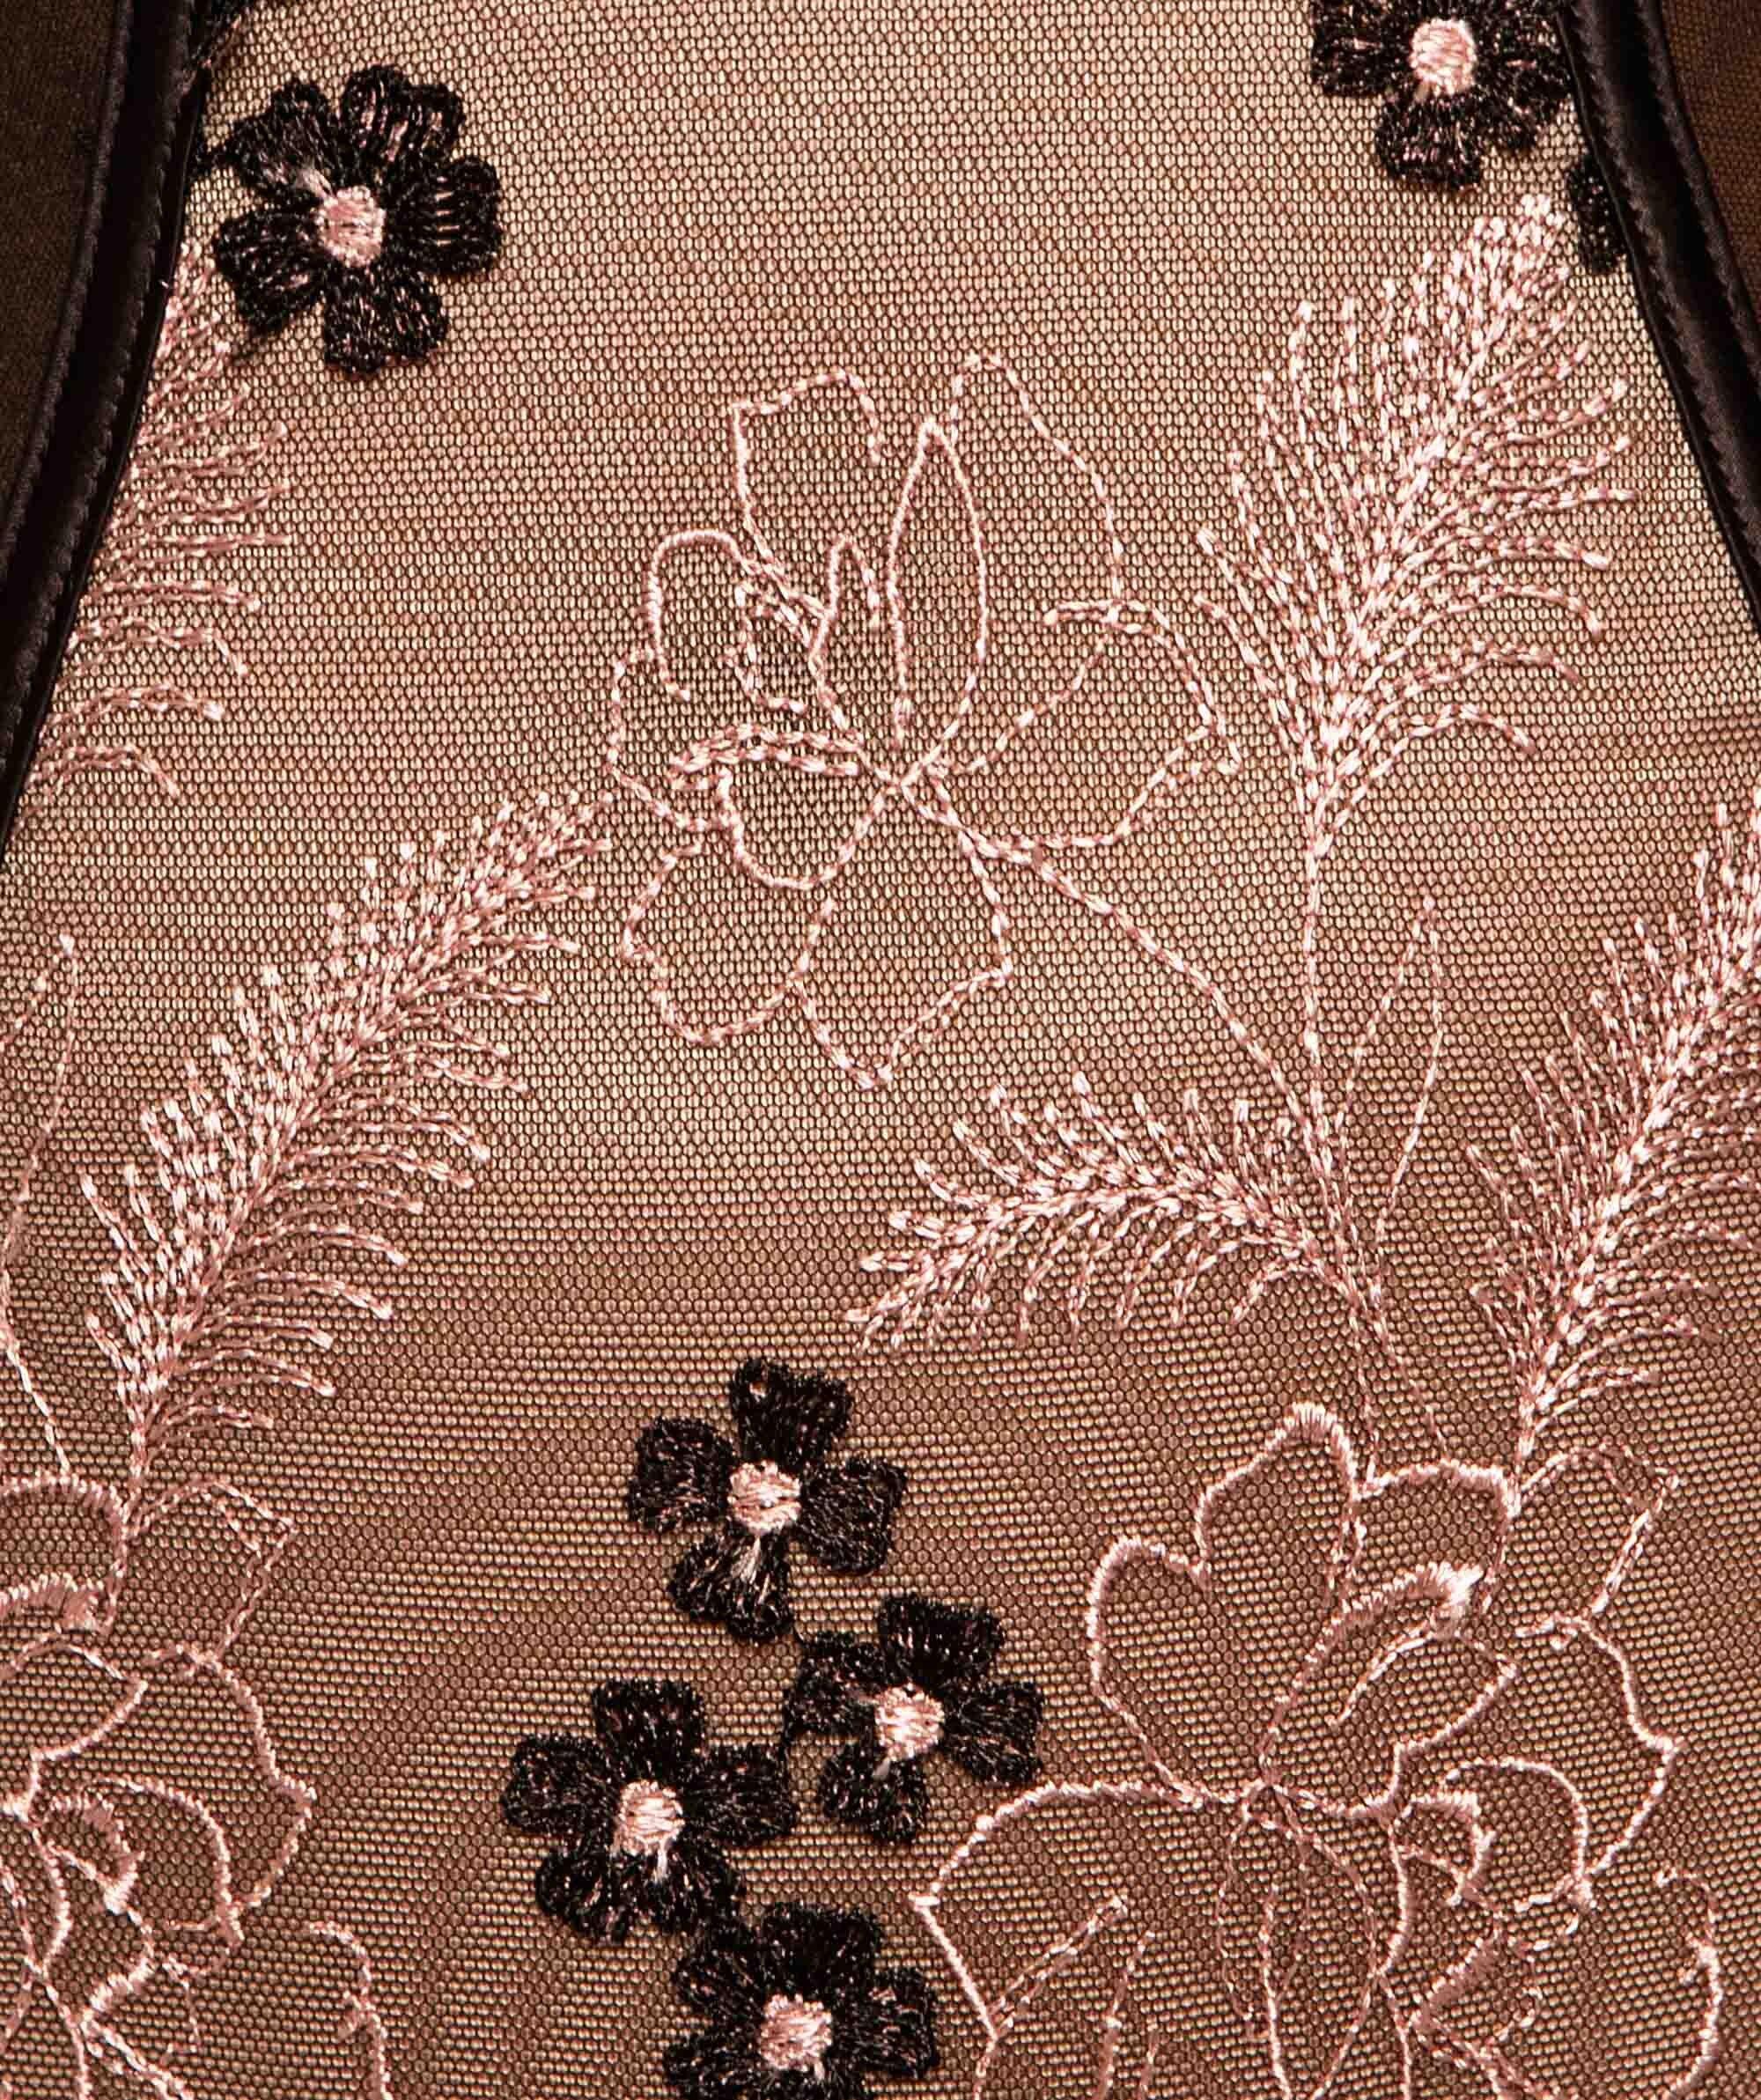 Enchanted Orleans High Waisted V-String Knicker - Black/Rose Gold